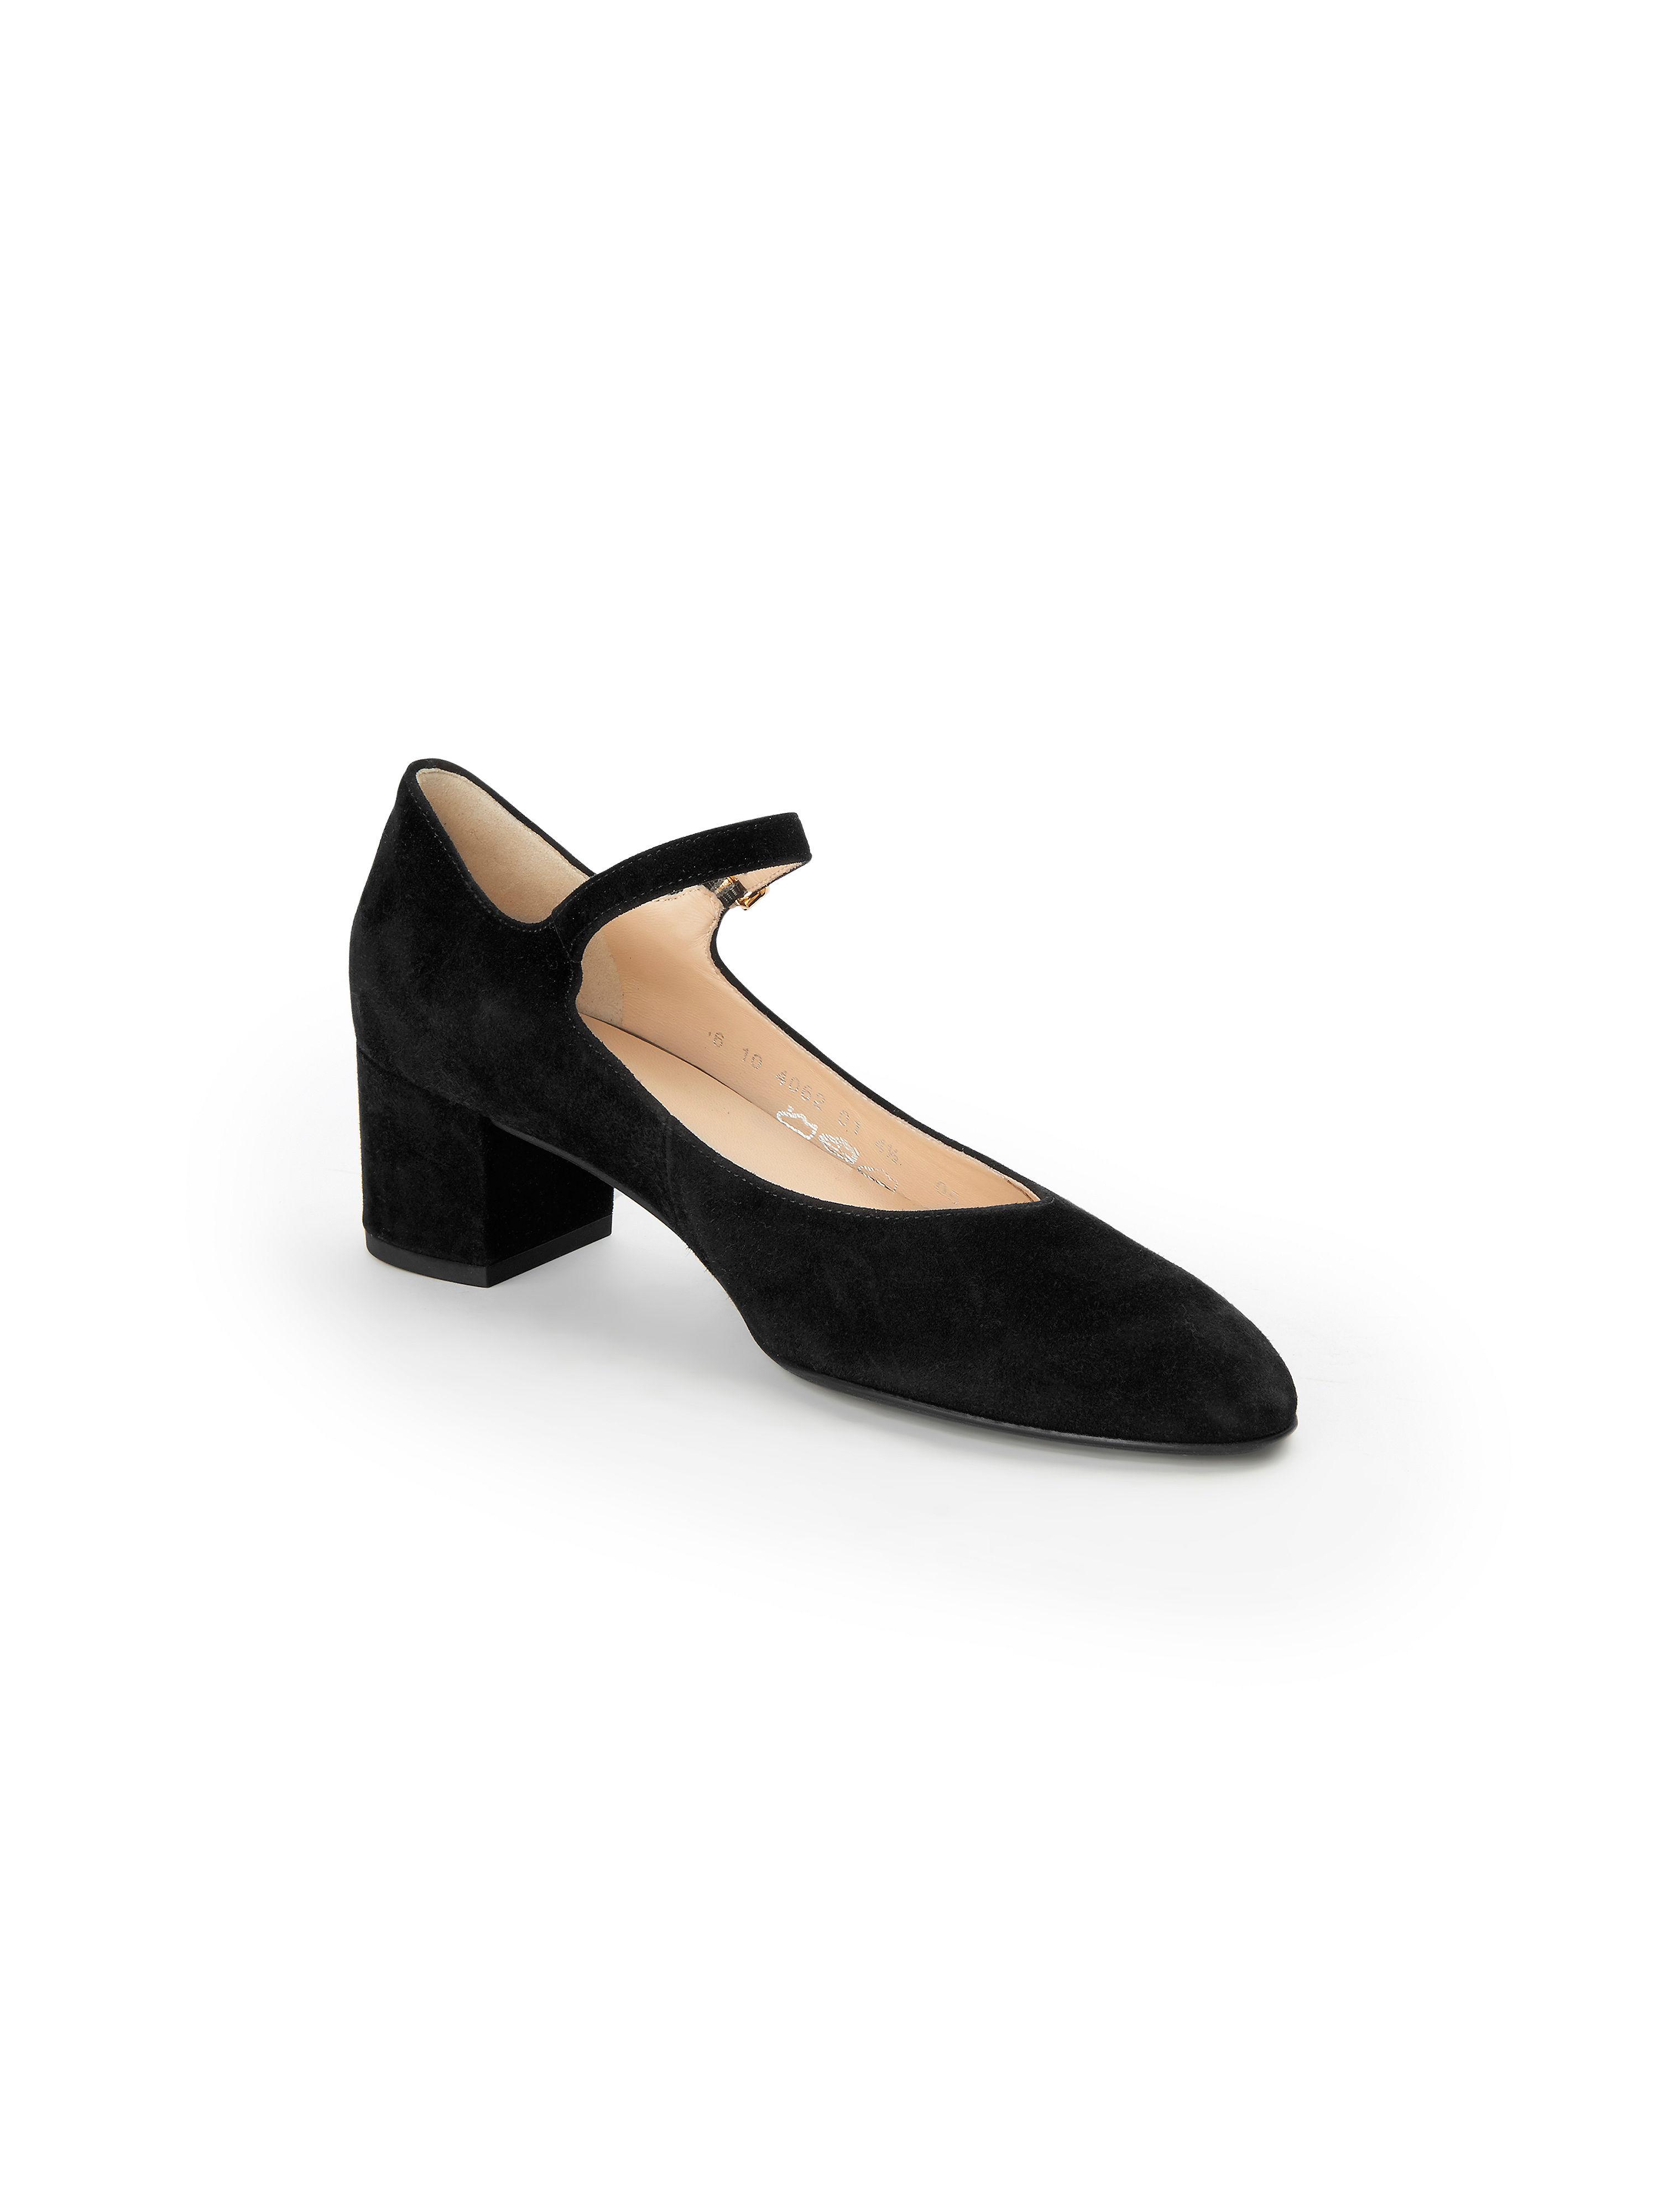 Högl - Spangen-Pumps aus 100% Leder - Schwarz Gute Qualität beliebte Schuhe